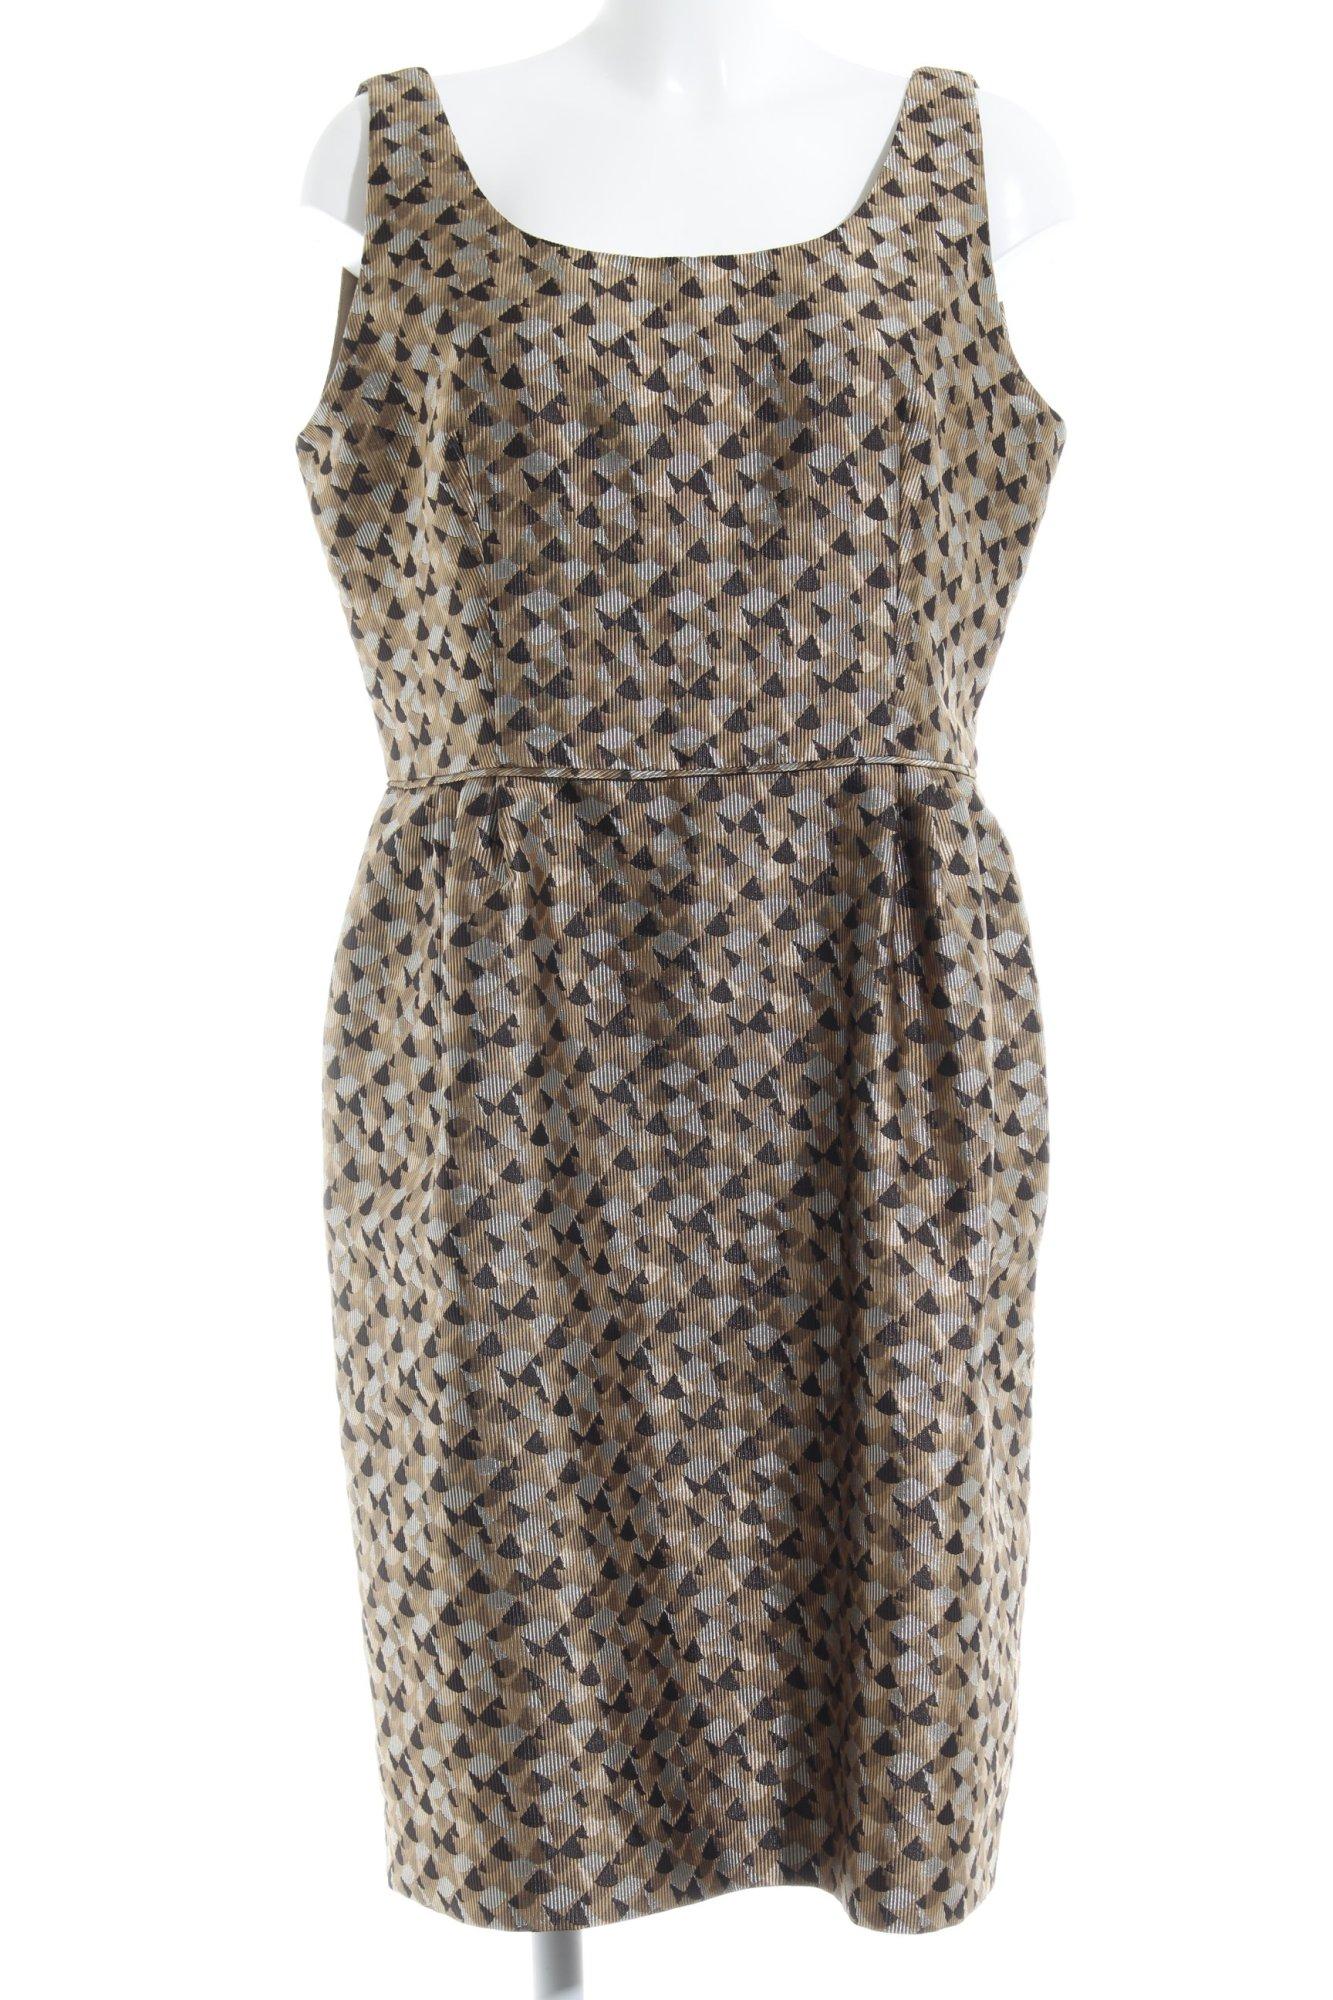 ARMANI Ballonkleid abstraktes Muster Elegant Damen Gr. DE 50 silberfarben Kleid